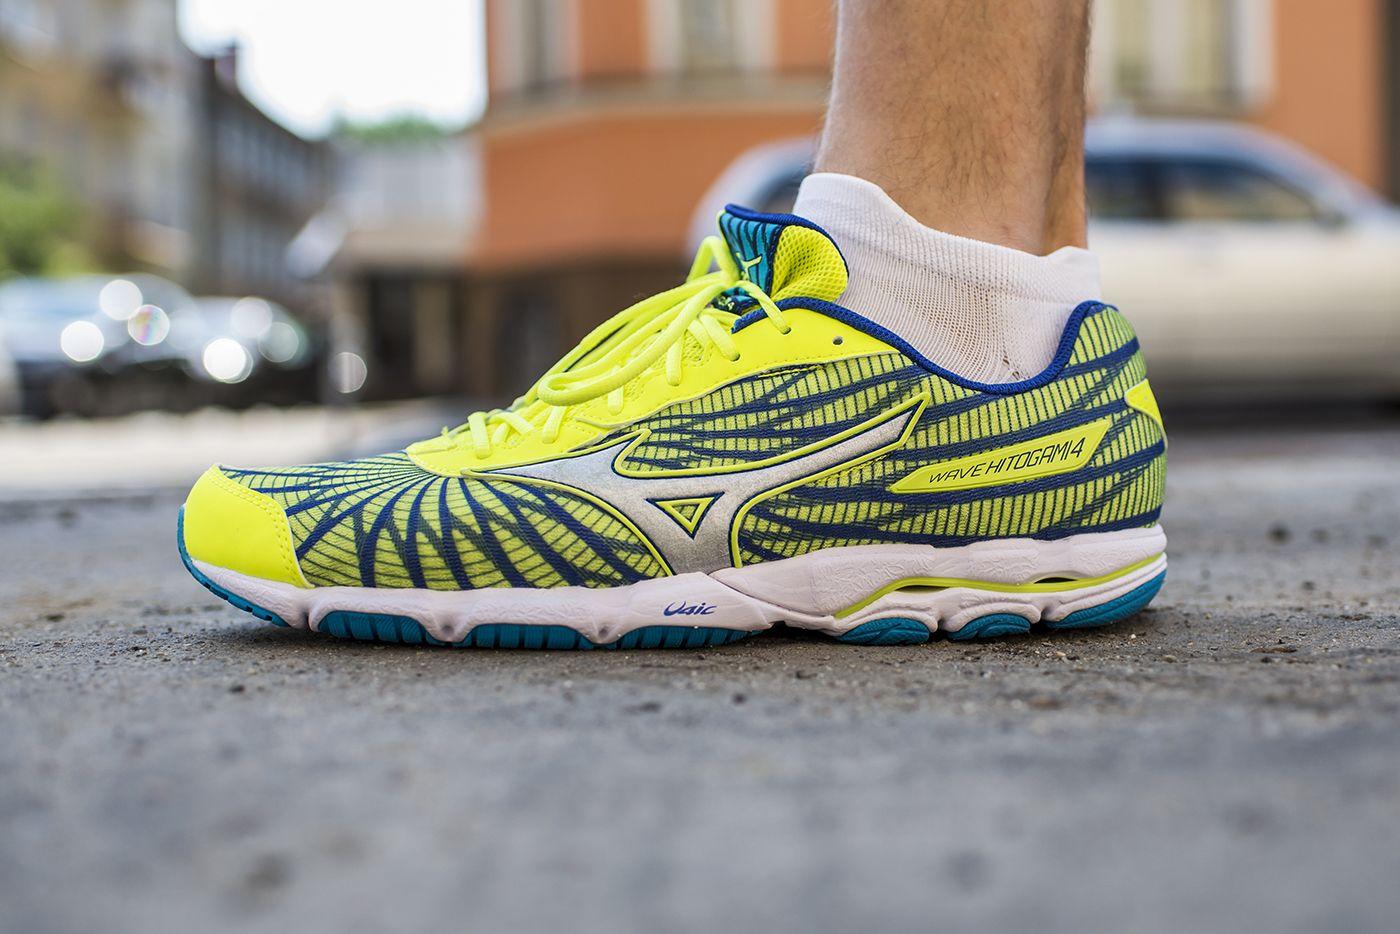 Mizuno Wave Hitogami 4 To But Startowy Przeznaczony Dla Osob Z Neutralnym Typem Stopy Running Shoes Hoka Running Shoes Sneakers